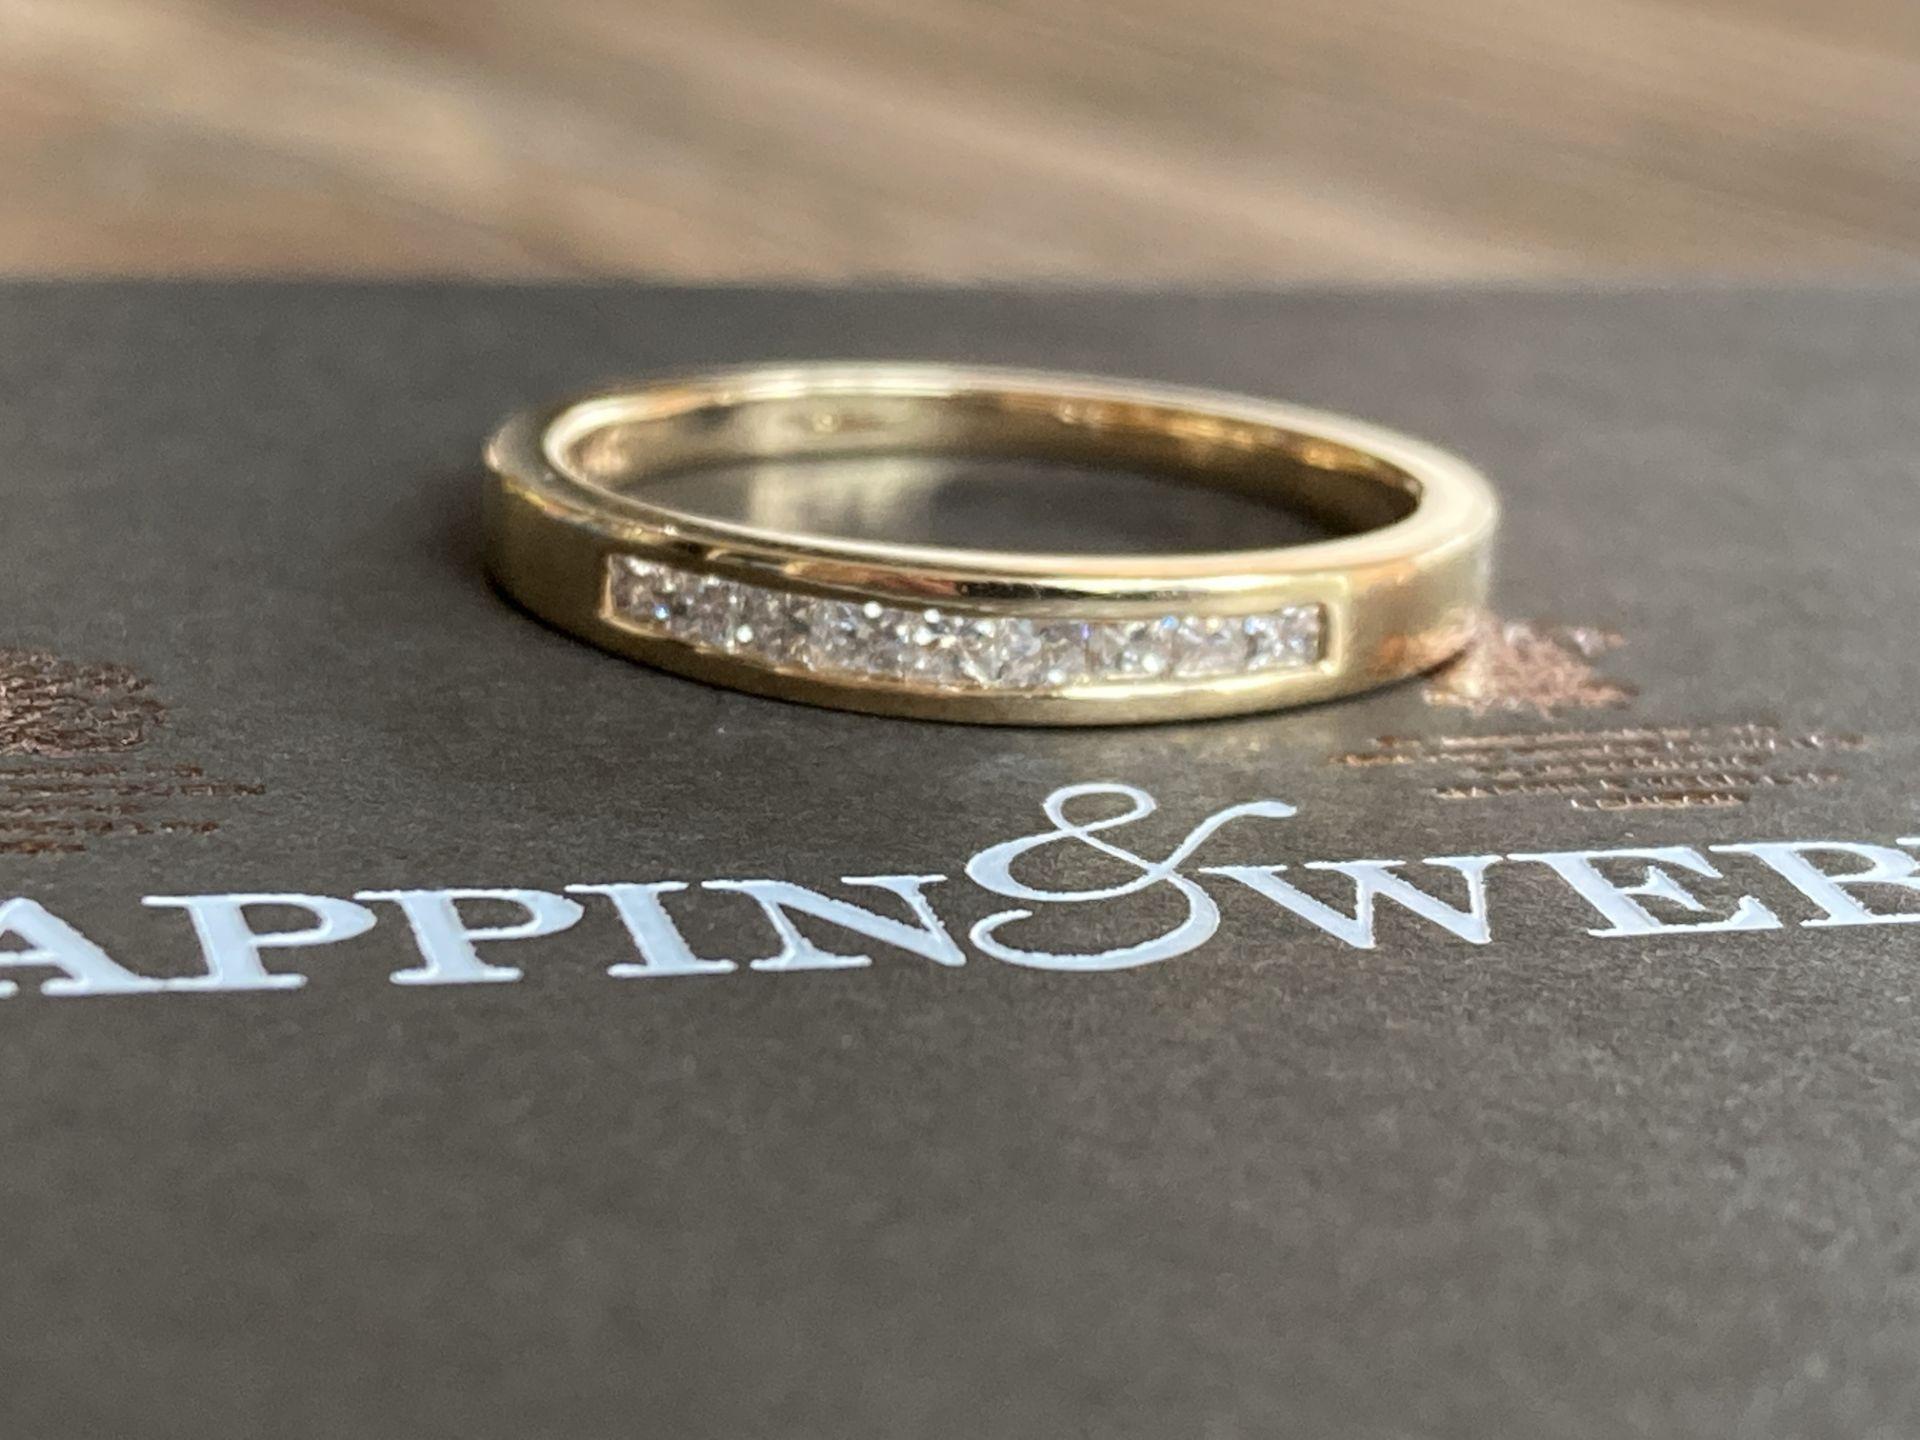 0.35CT DIAMOND SET RING IN 14K GOLD - Image 2 of 2